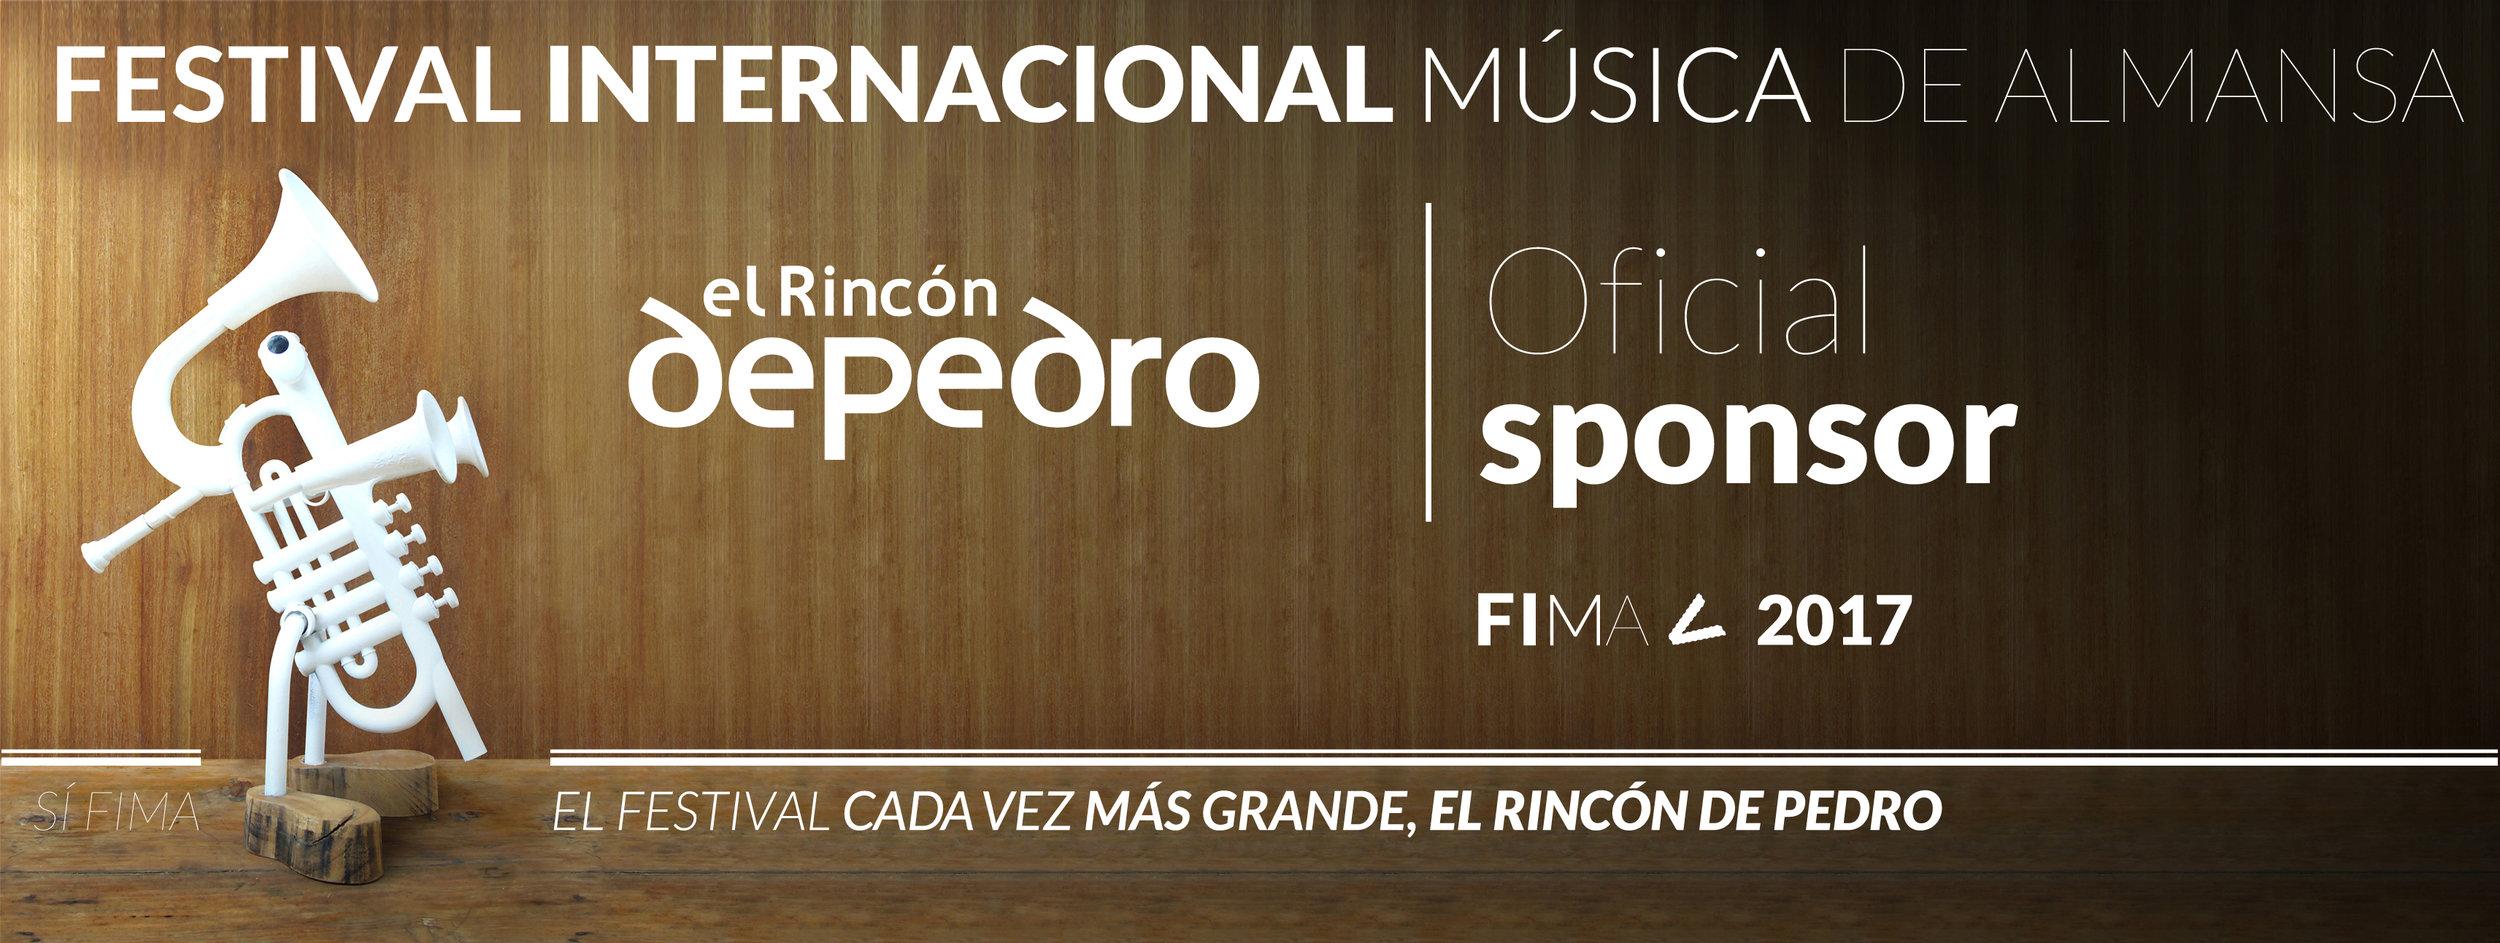 14_sponsor_depedro.jpg